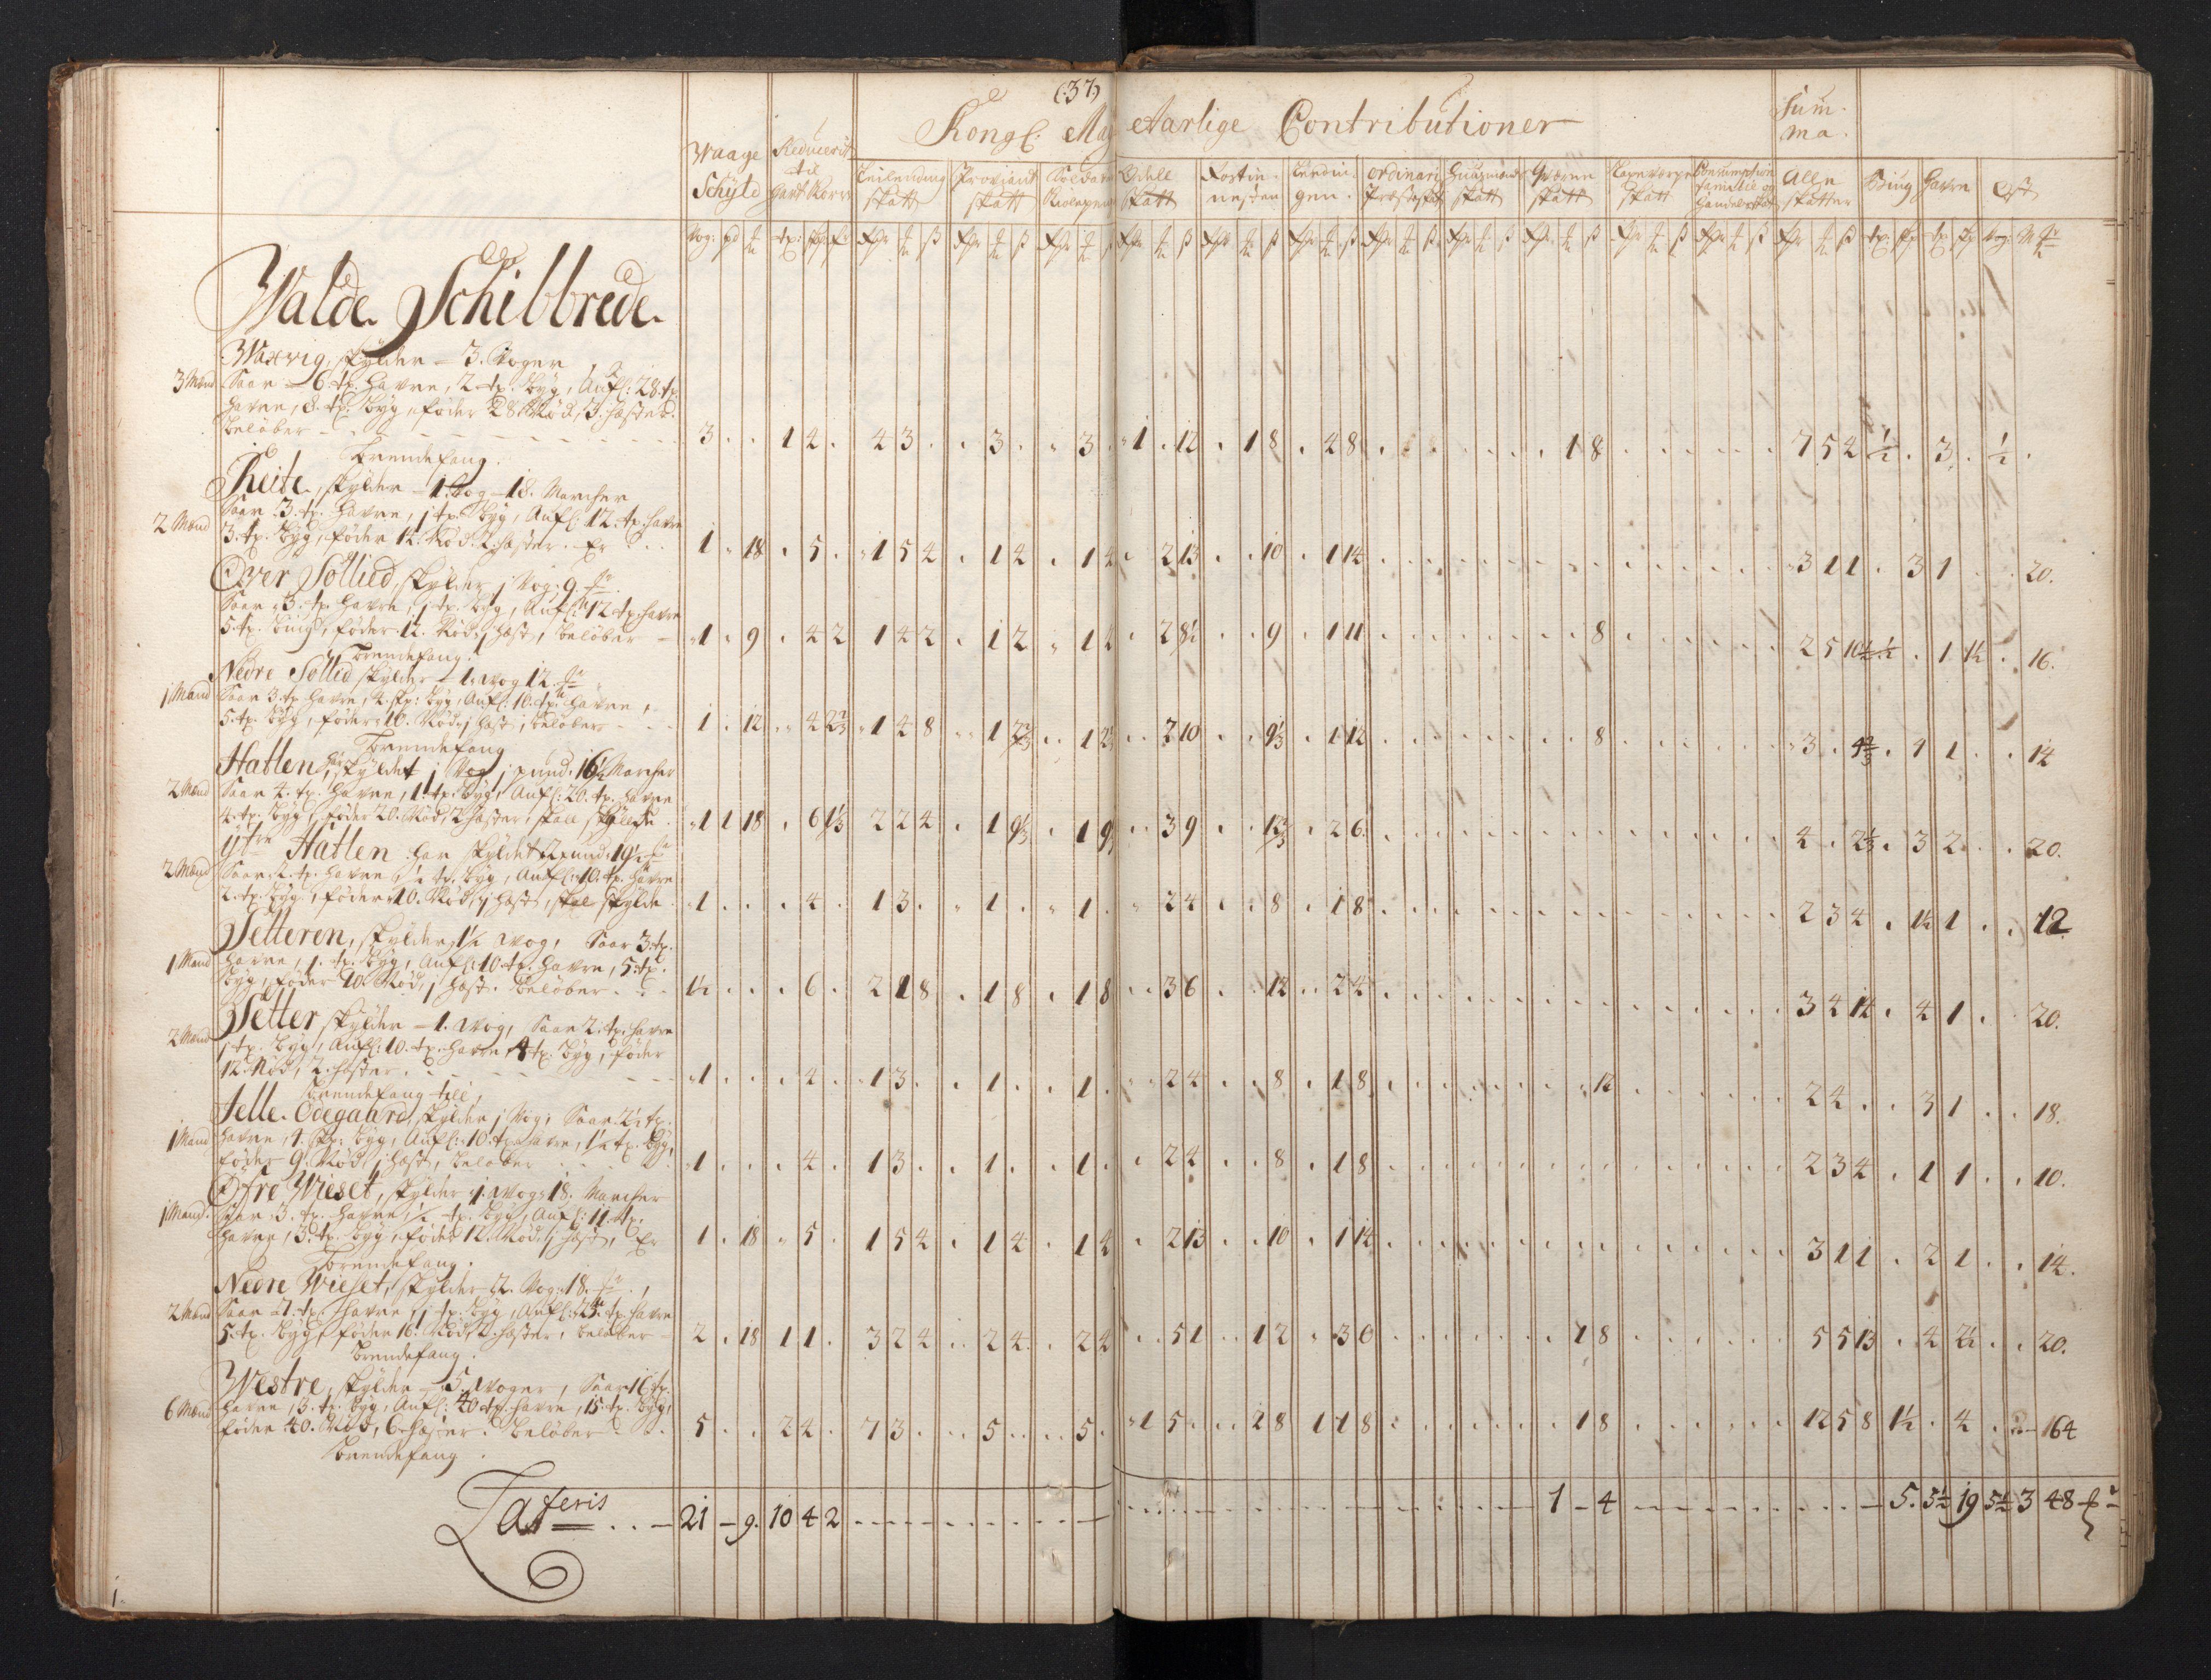 RA, Rentekammeret inntil 1814, Realistisk ordnet avdeling, N/Nb/Nbf/L0149: Sunnmøre, prøvematrikkel, 1714, s. 36b-37a